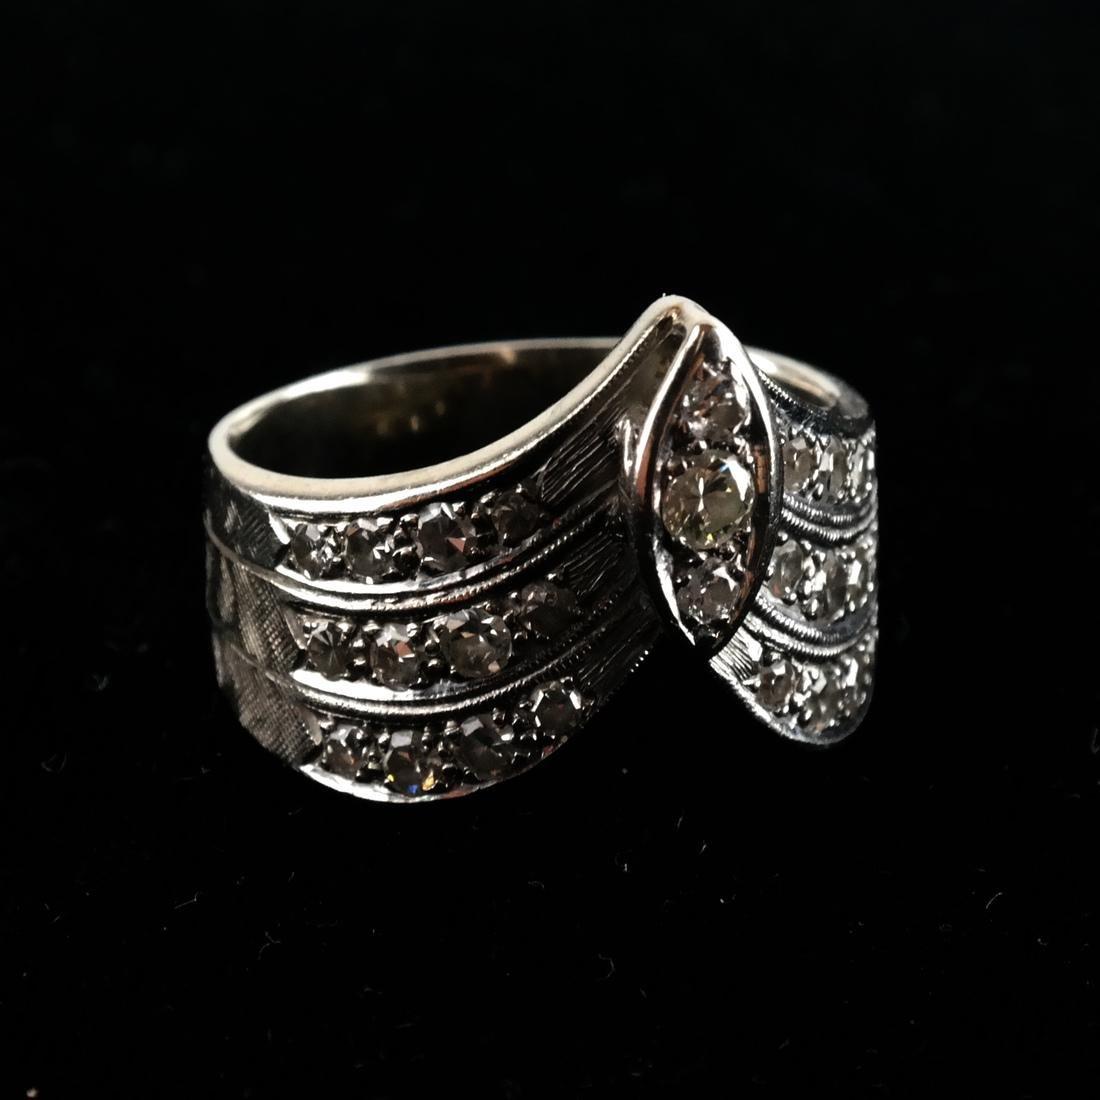 14k WG & Diamond Cocktail Ring - 7